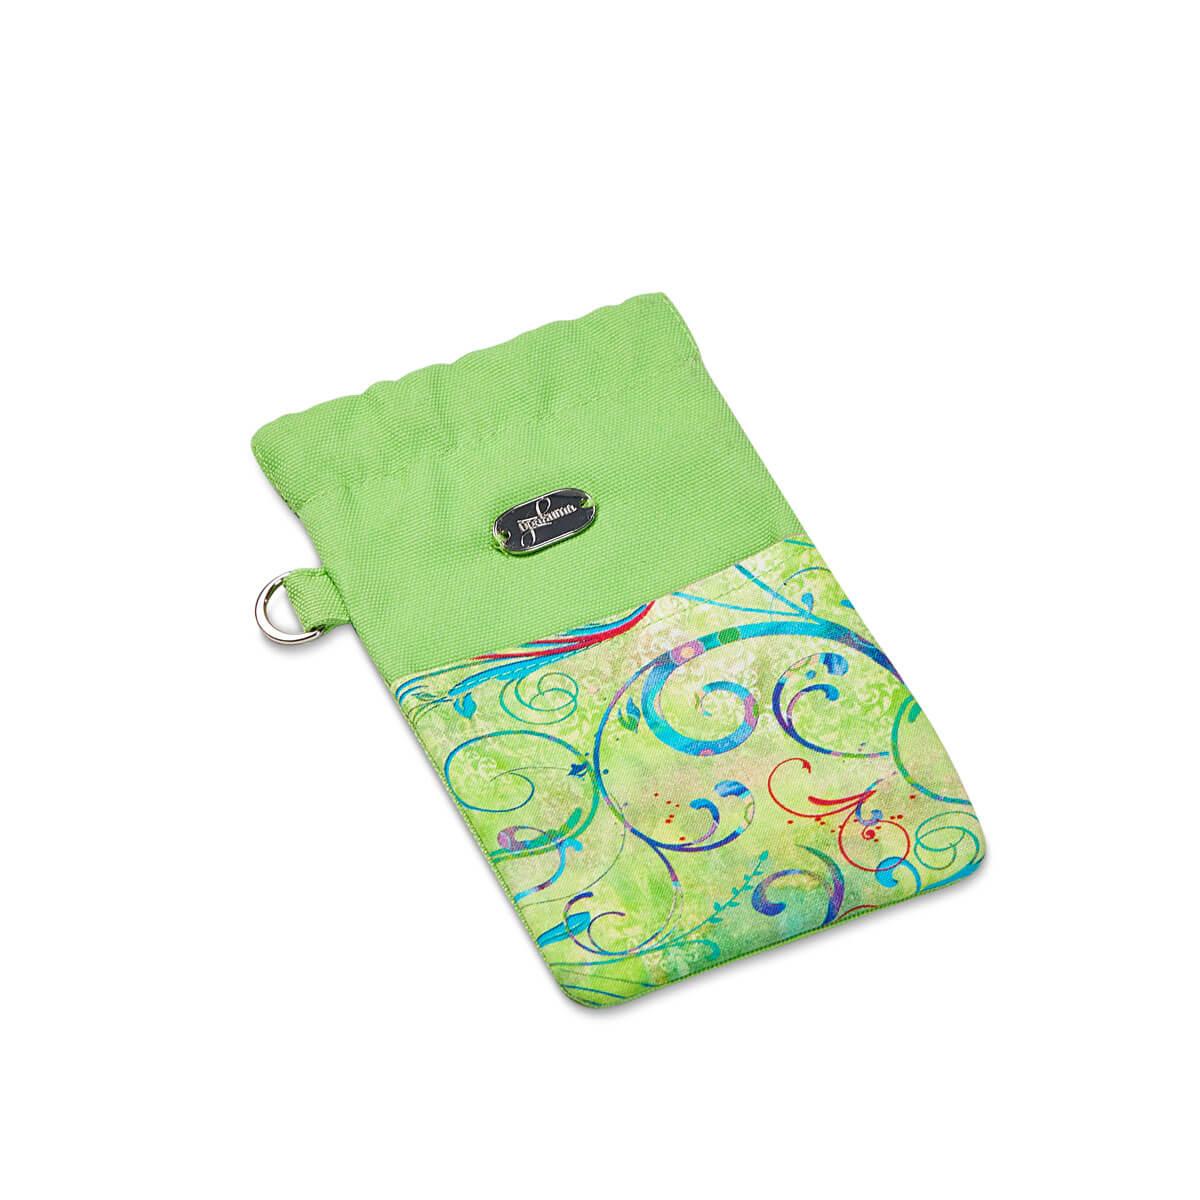 c0374afcfe Tote-Bag-Set-Citrus-Swirl-Smart-PhoneMP3-PlayerSunglass-